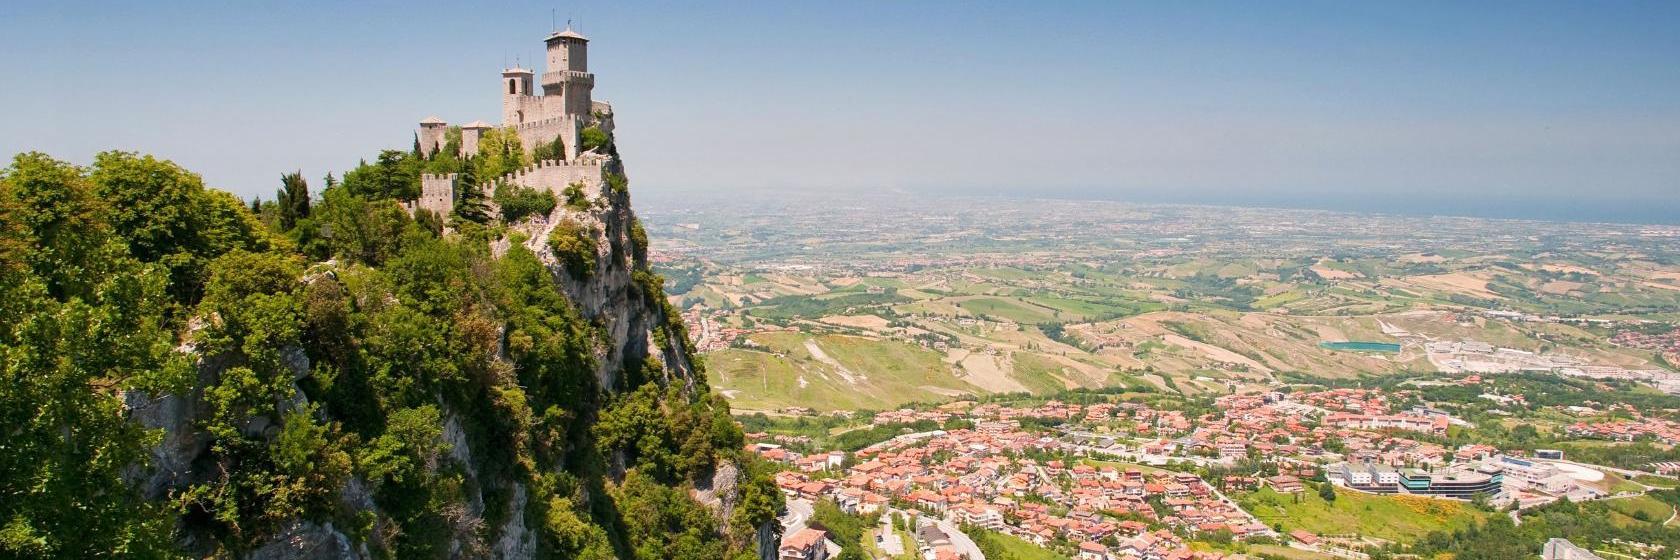 San Marino Adventures (Acquaviva) - 2020 All - TripAdvisor